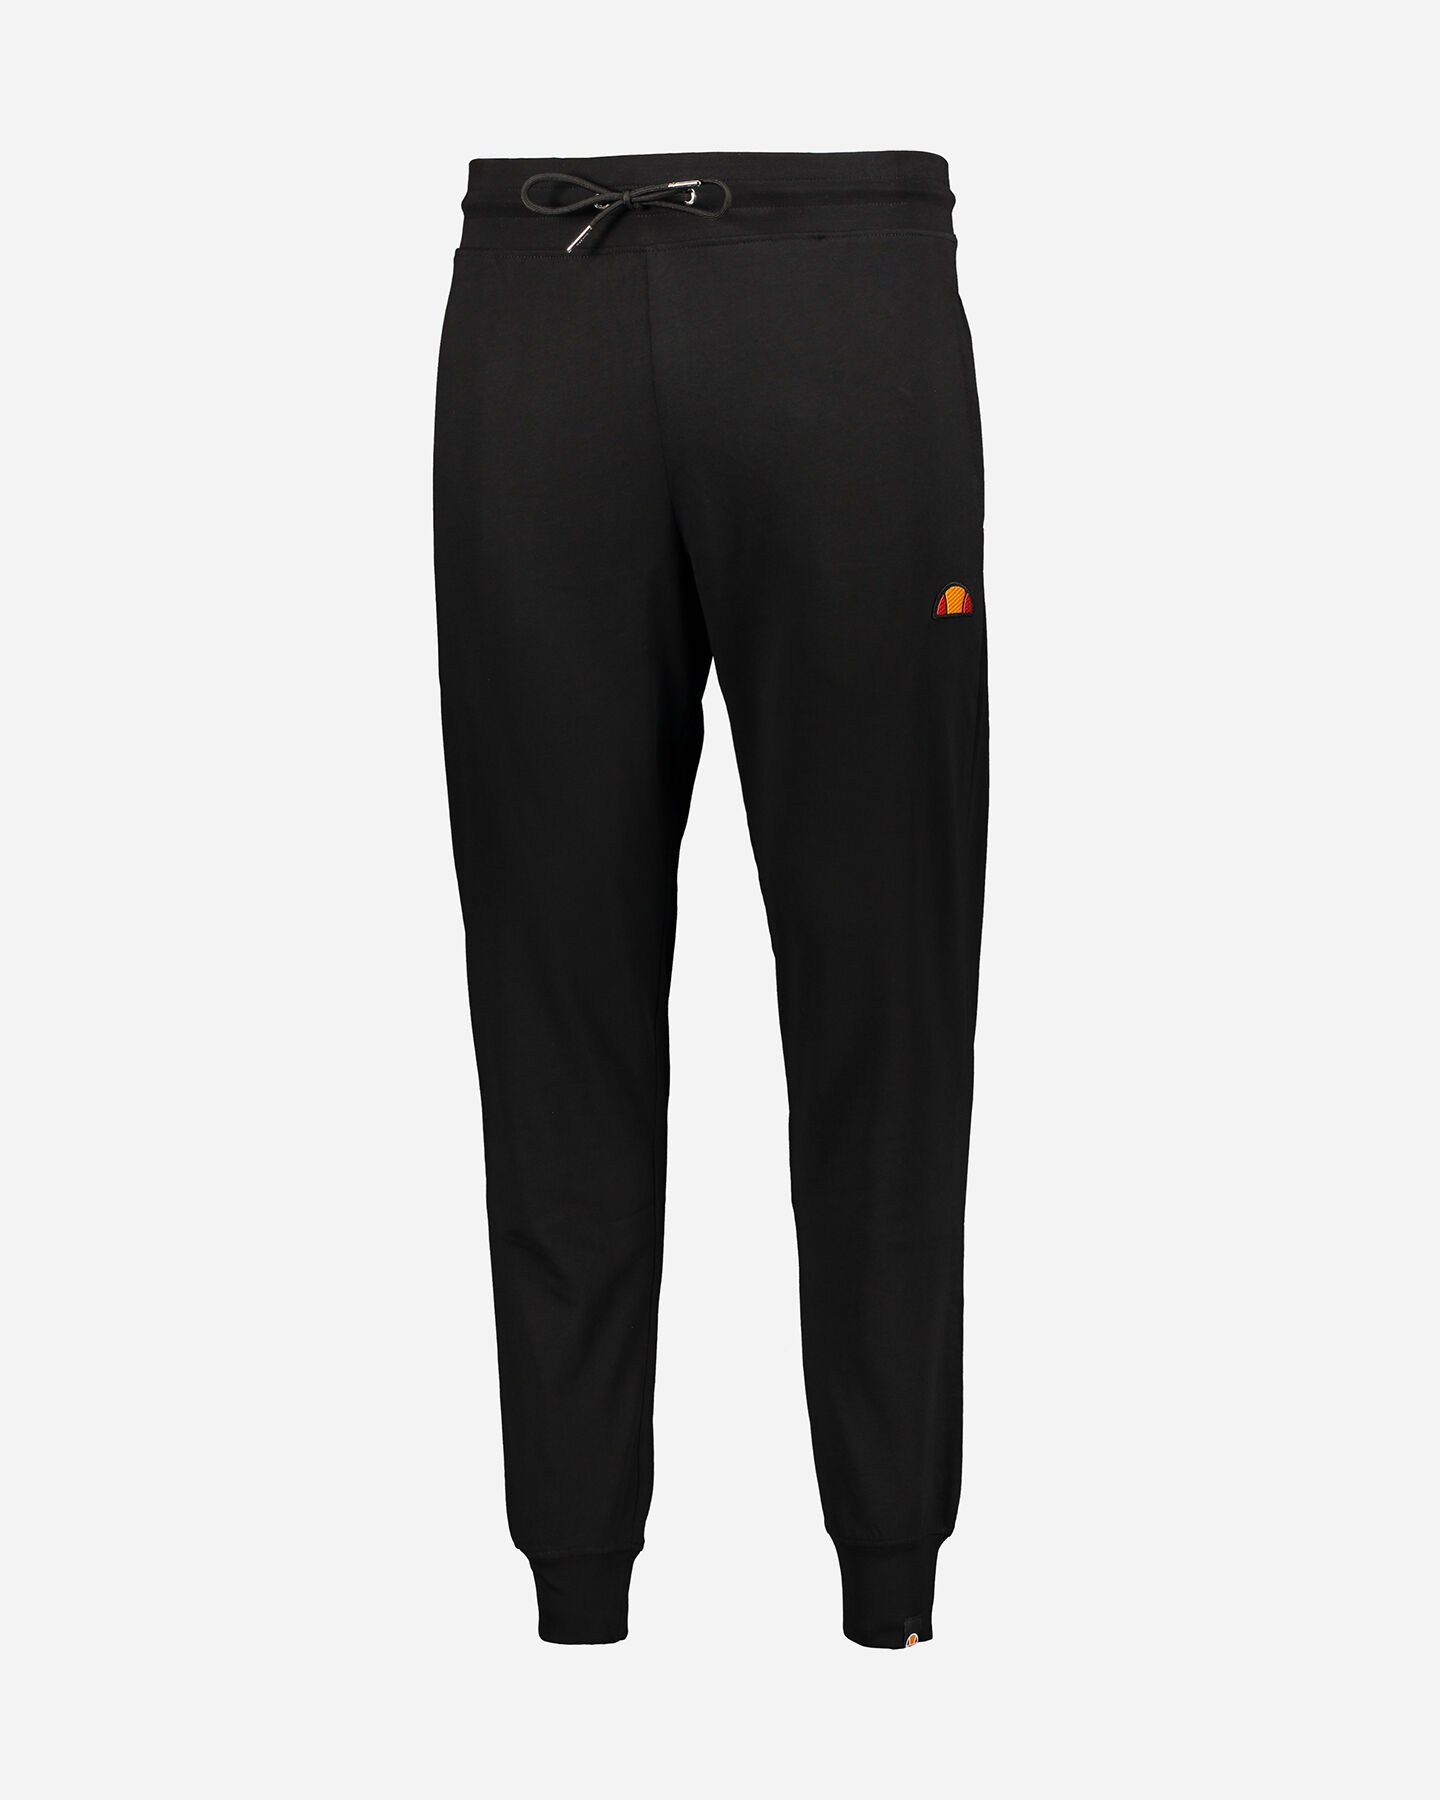 Pantalone ELLESSE BASIC M S4087821 scatto 4